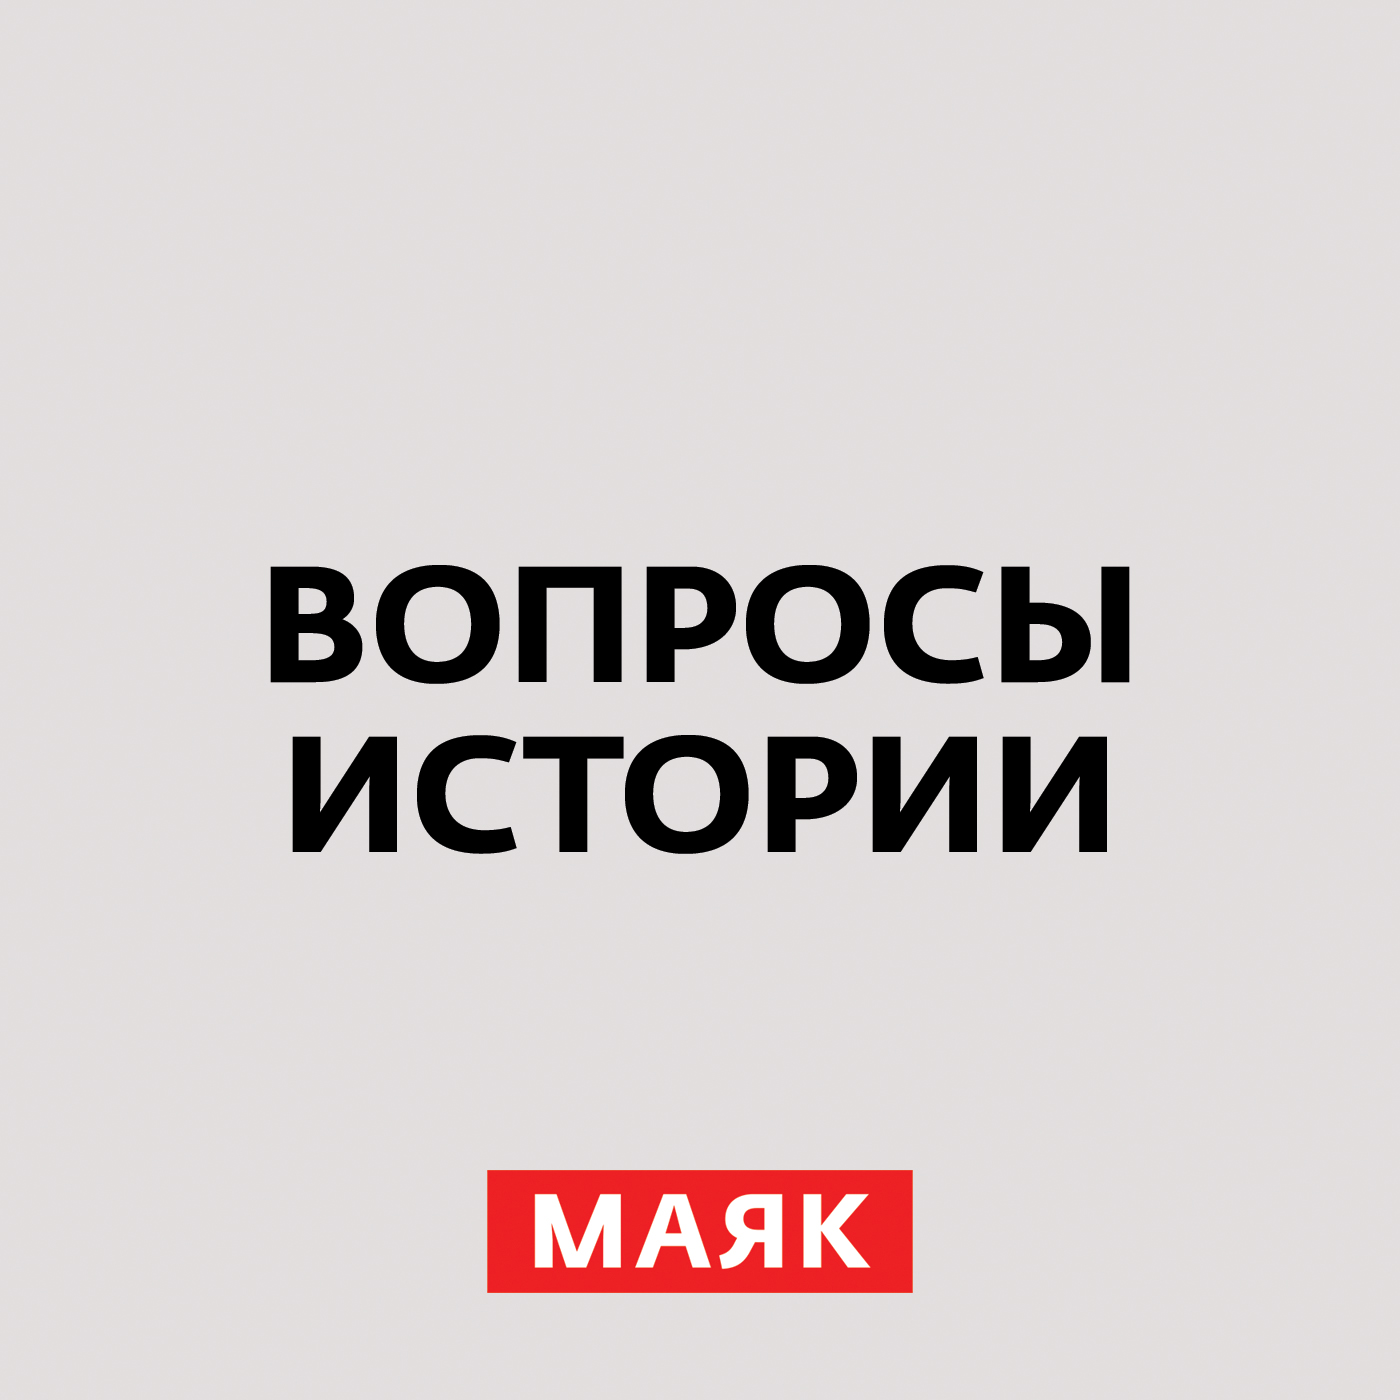 Андрей Светенко При Хрущёве люди освободились от страха андрей светенко при хрущёве люди освободились от страха